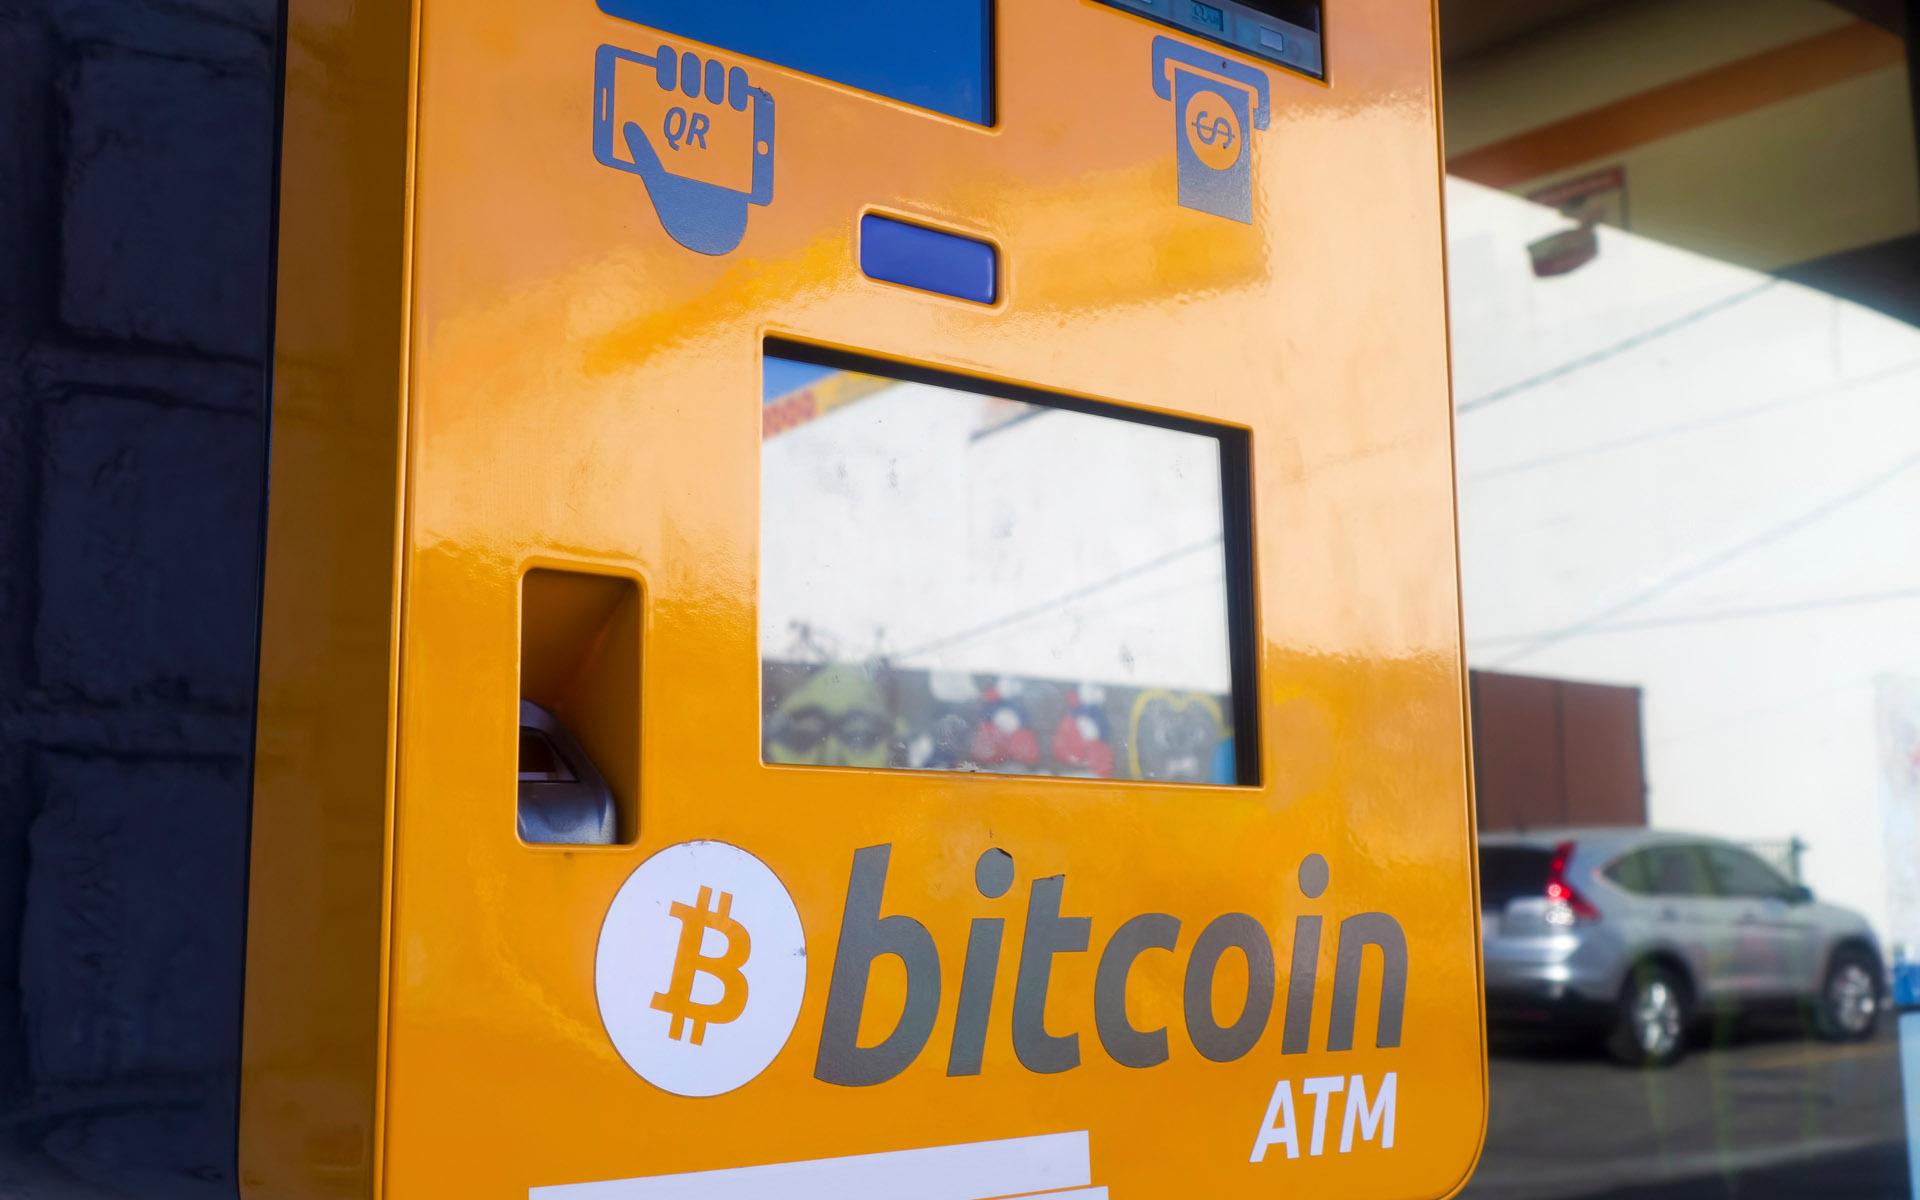 Lightning Network Bitcoin ATM